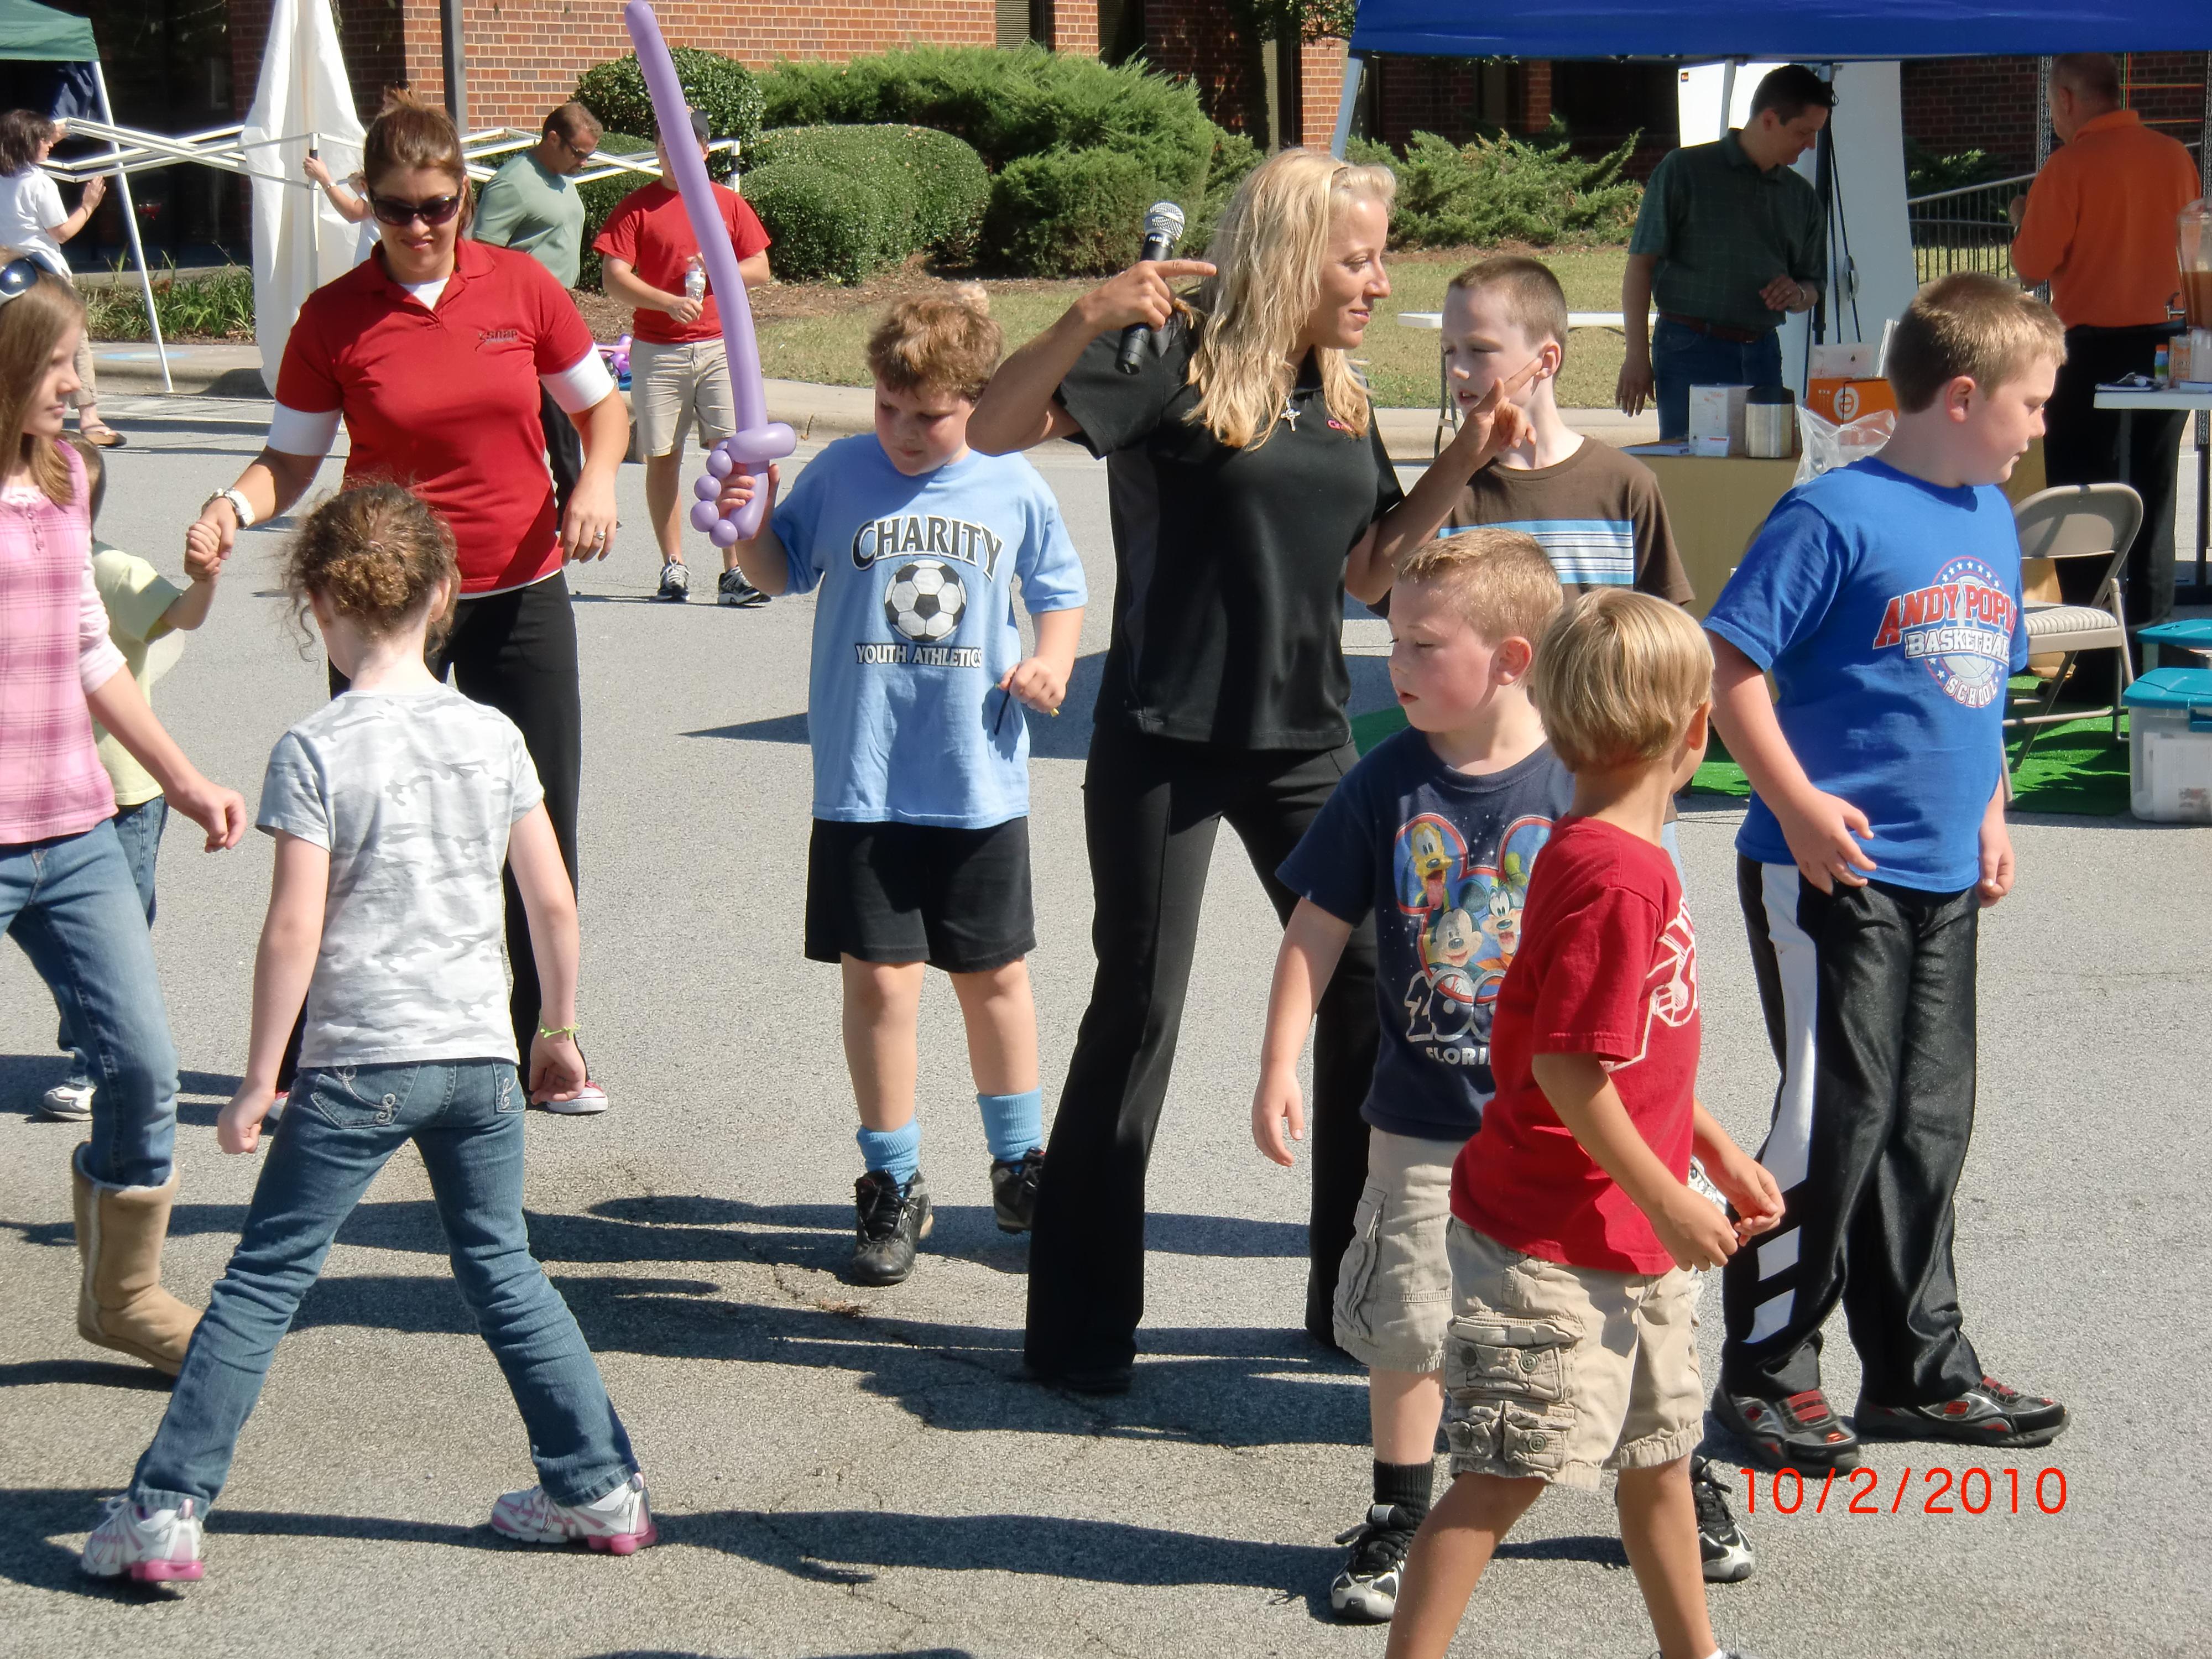 cupid shuffle with kids